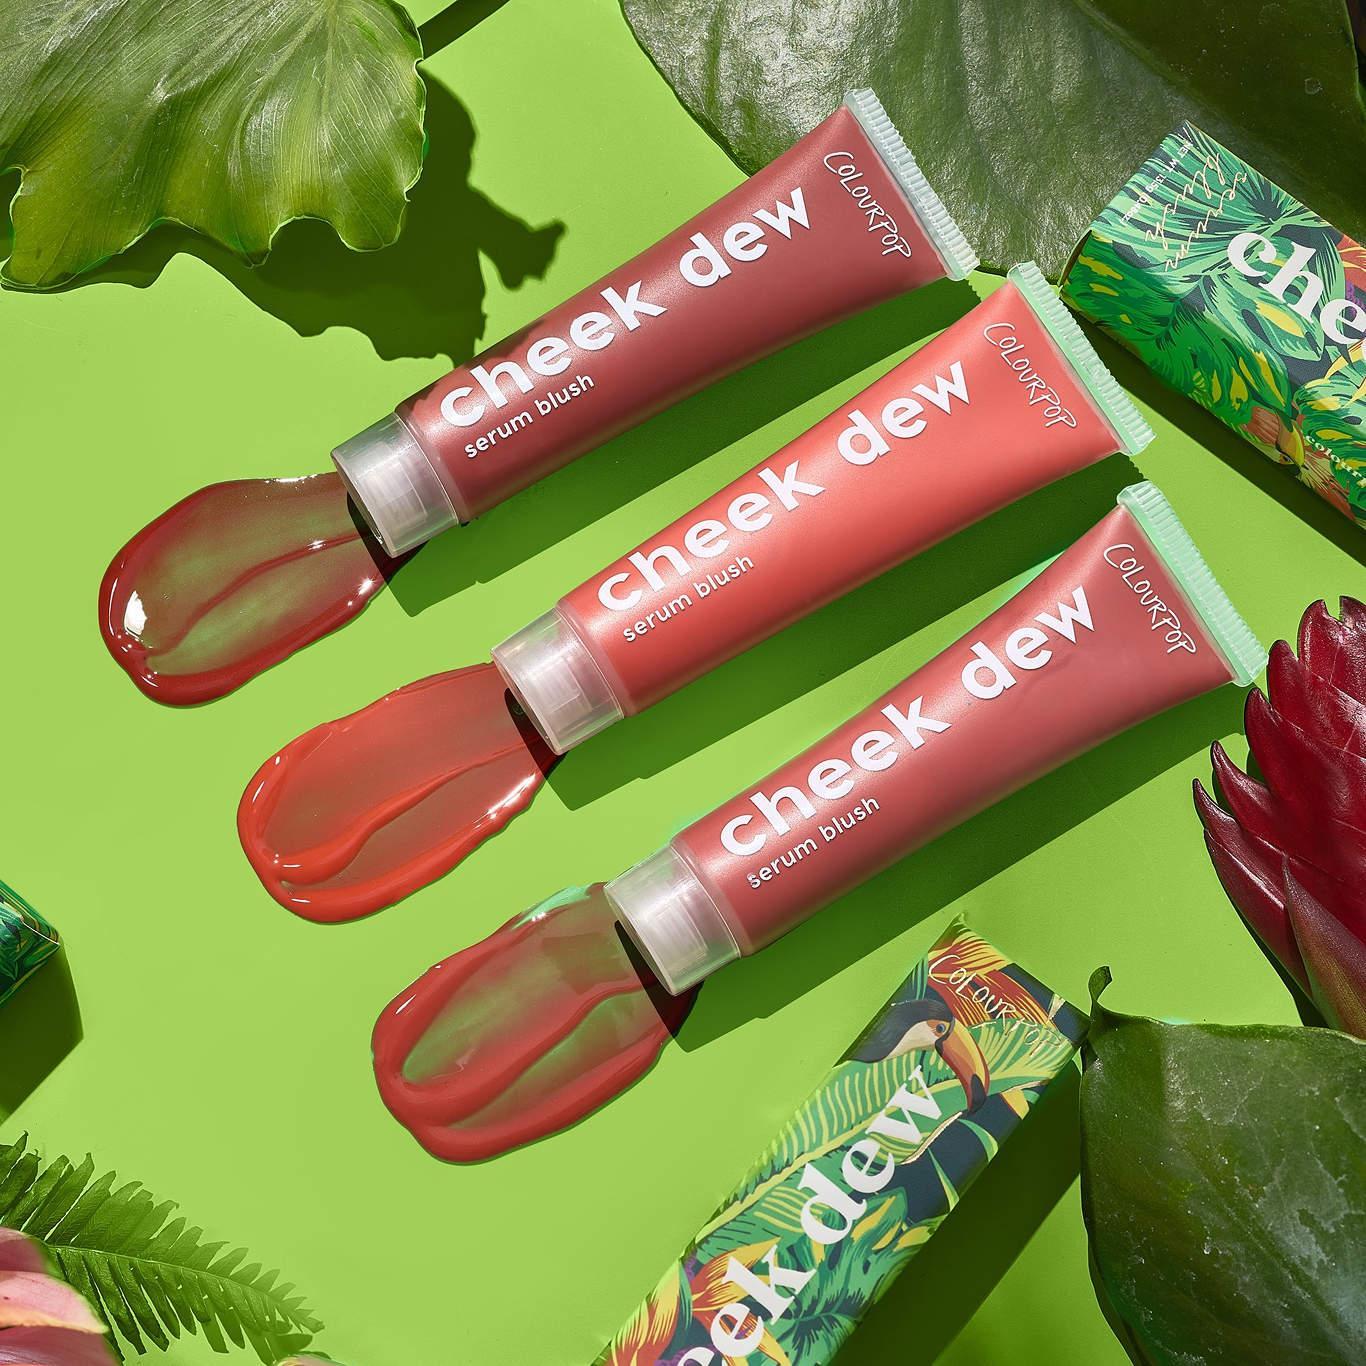 Colourpop Lush Life Collection Cheek Dew Serum Blush Promo